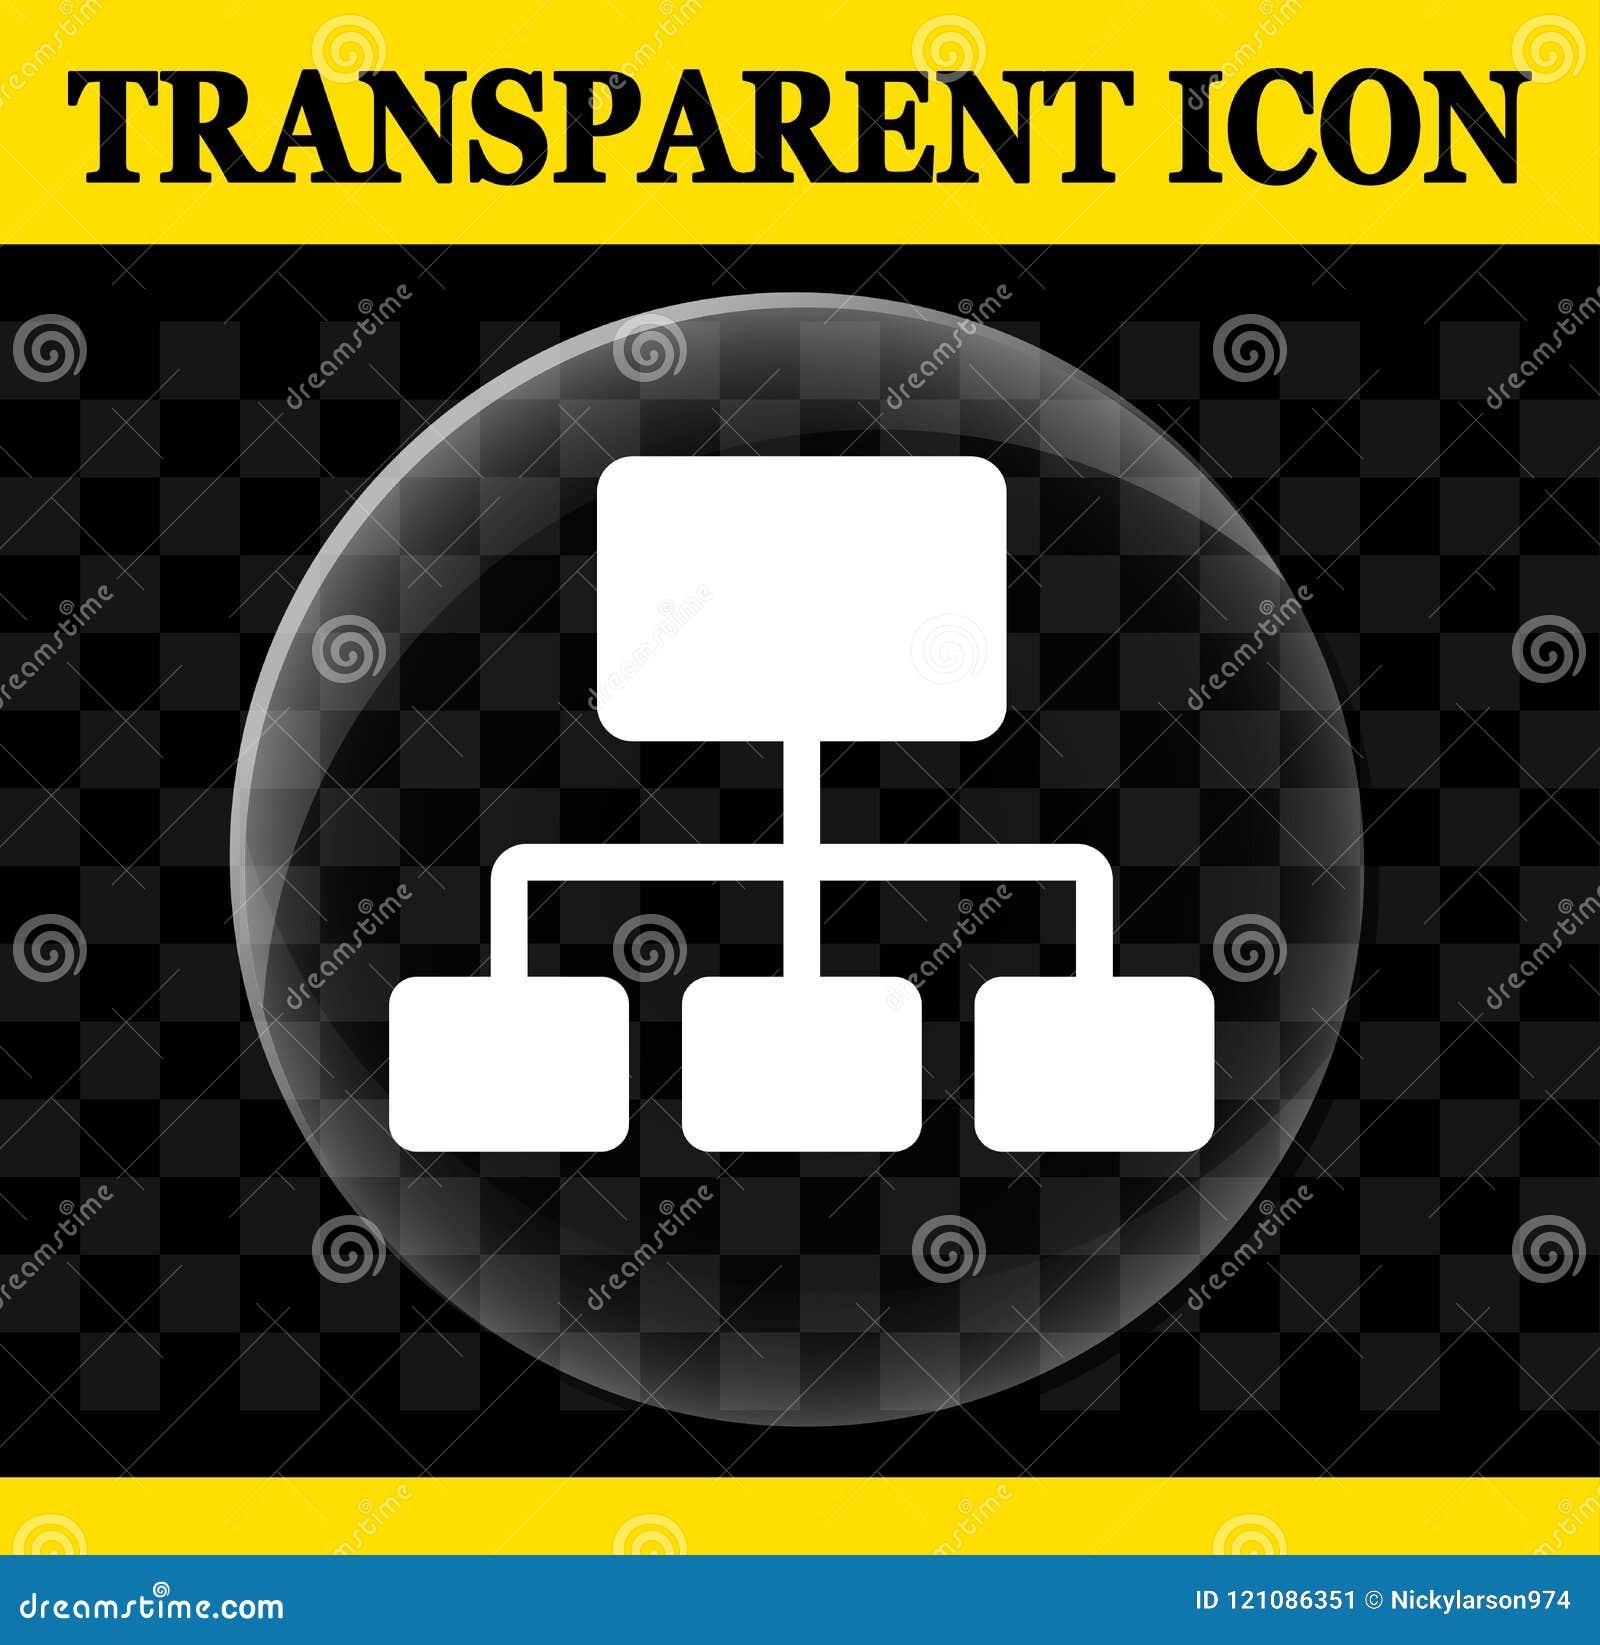 Organization vector circle transparent icon